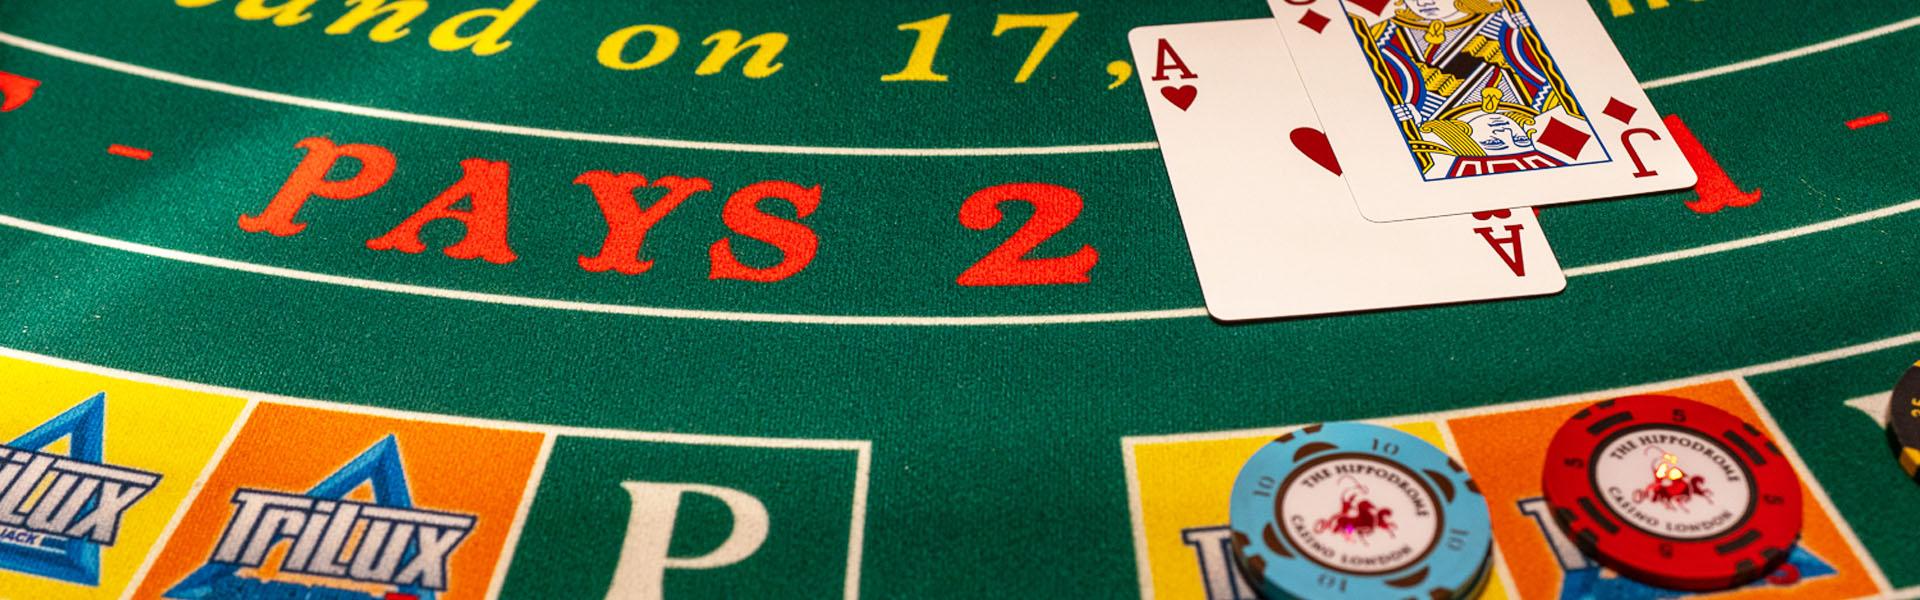 Play Blackjack | Rules of Blackjack – Hippodrome Casino